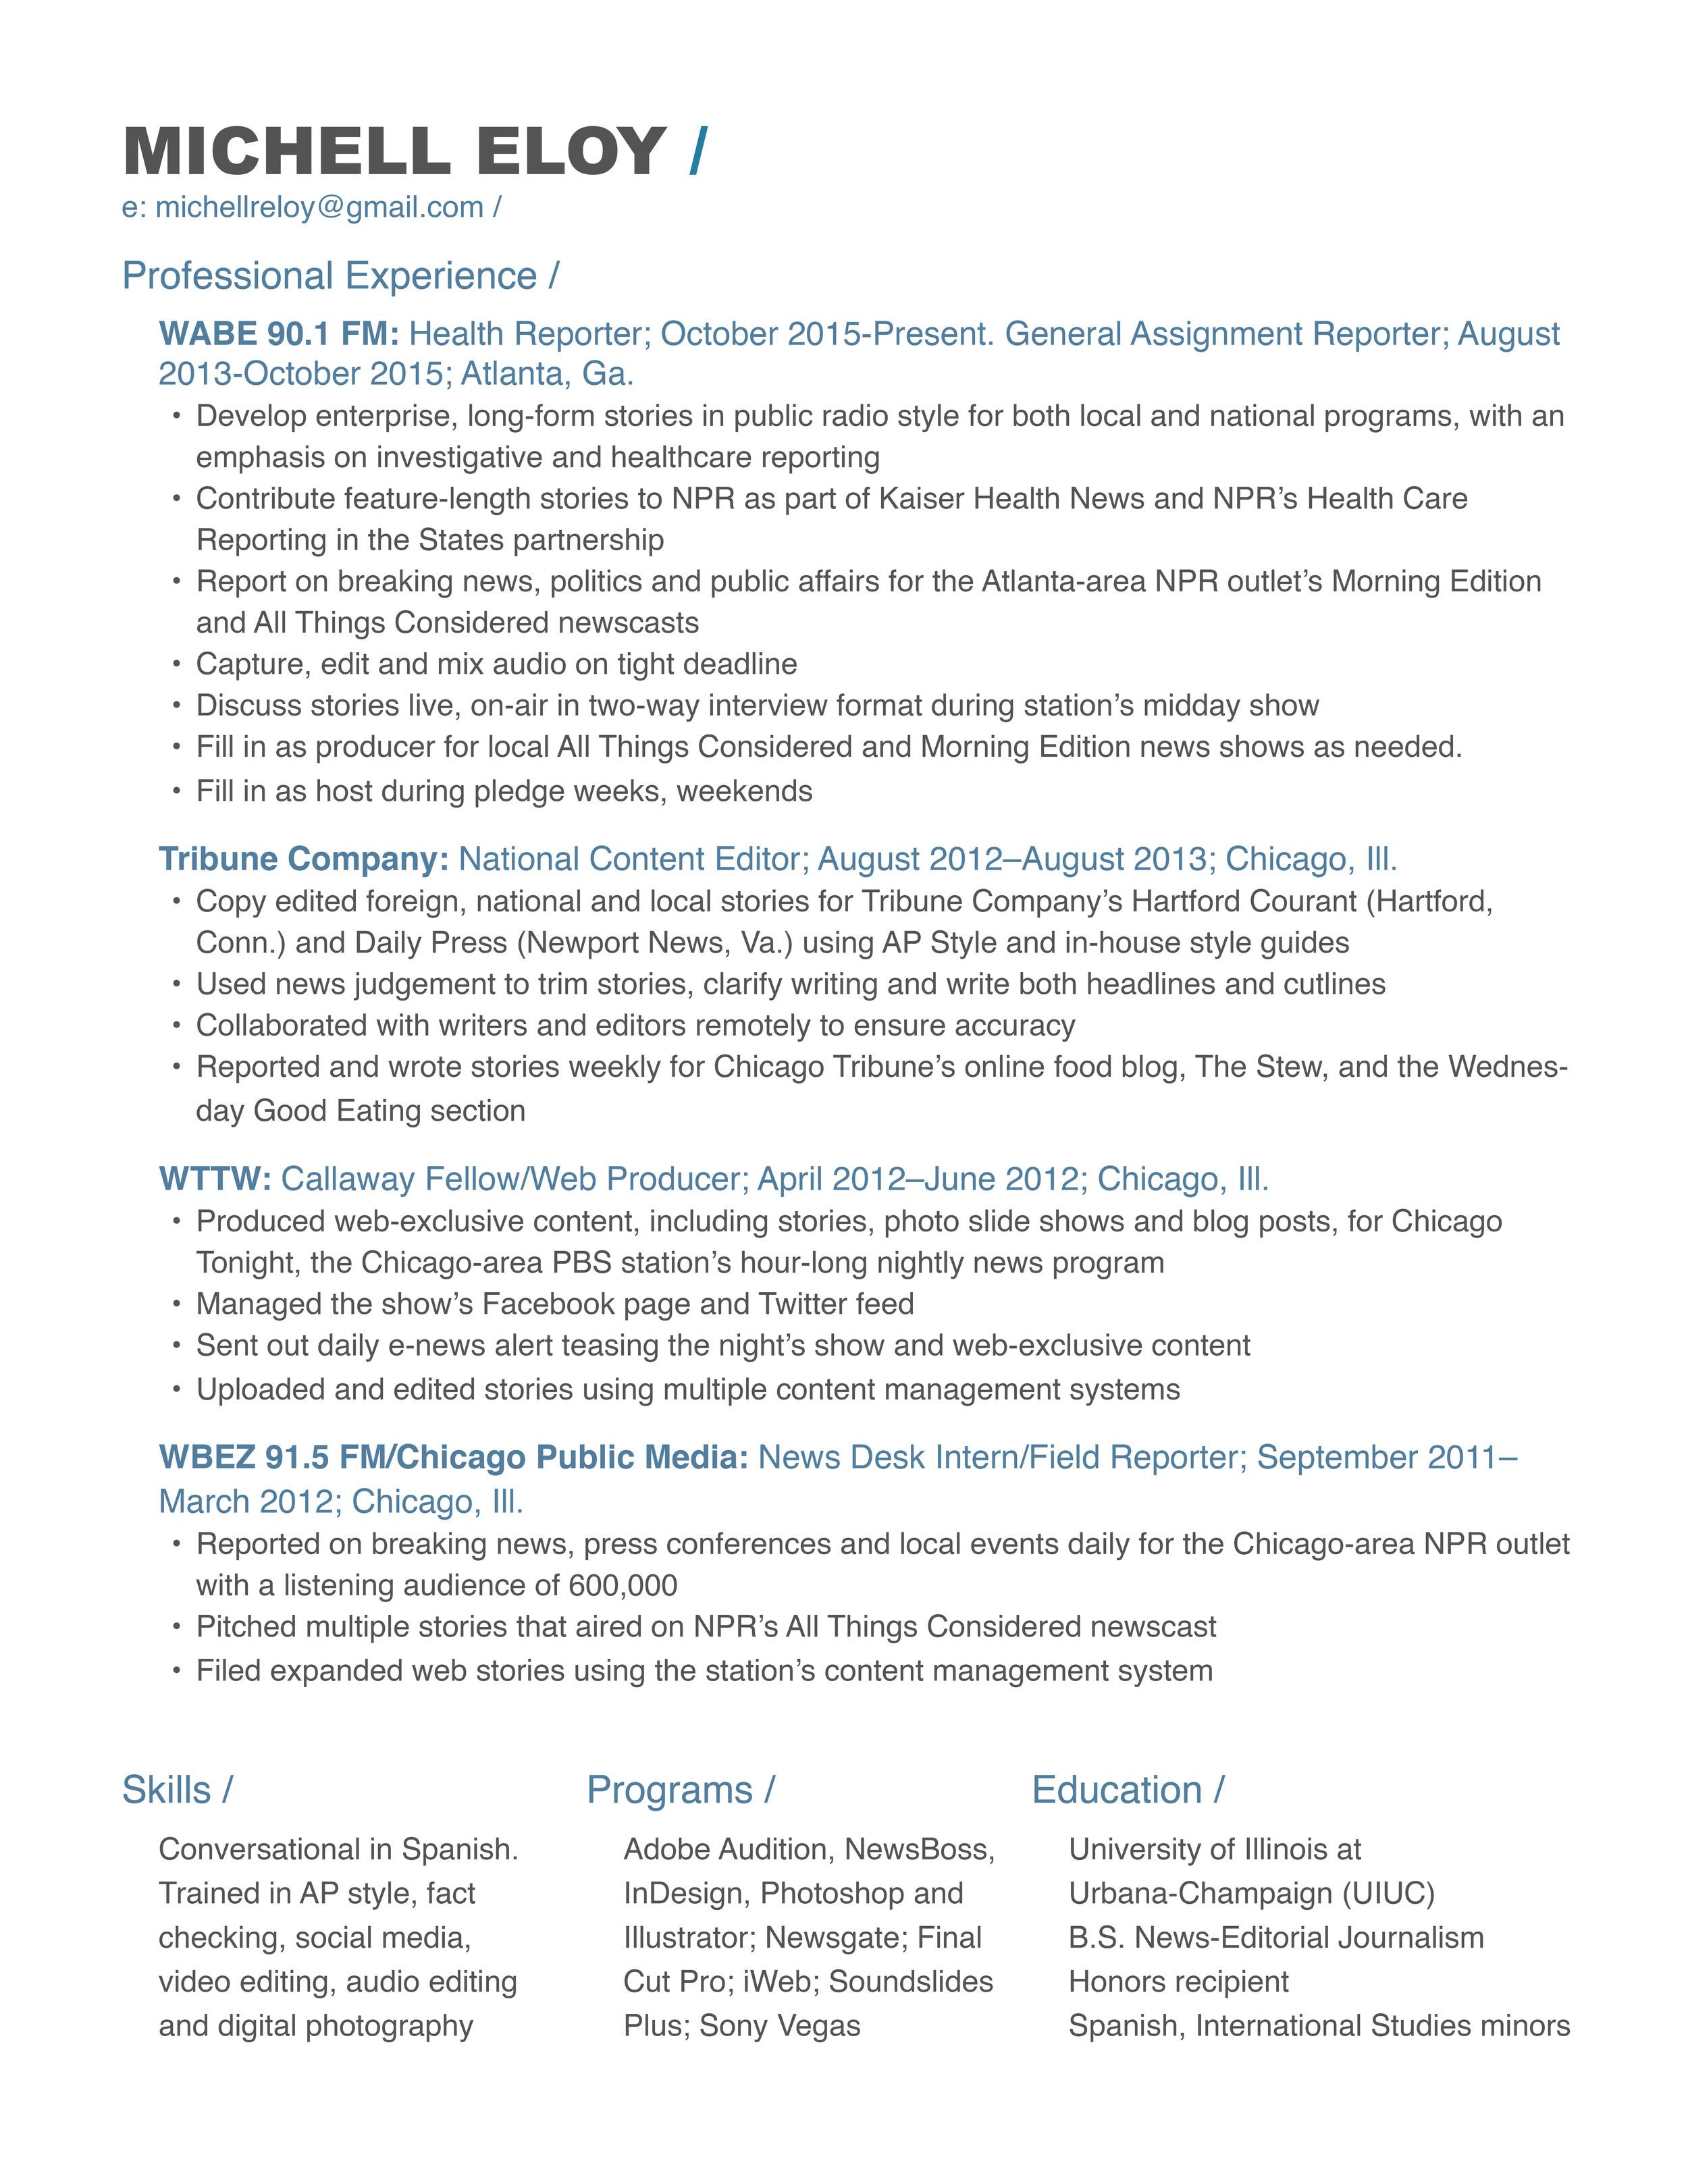 MEloy.Resume0216x.jpg